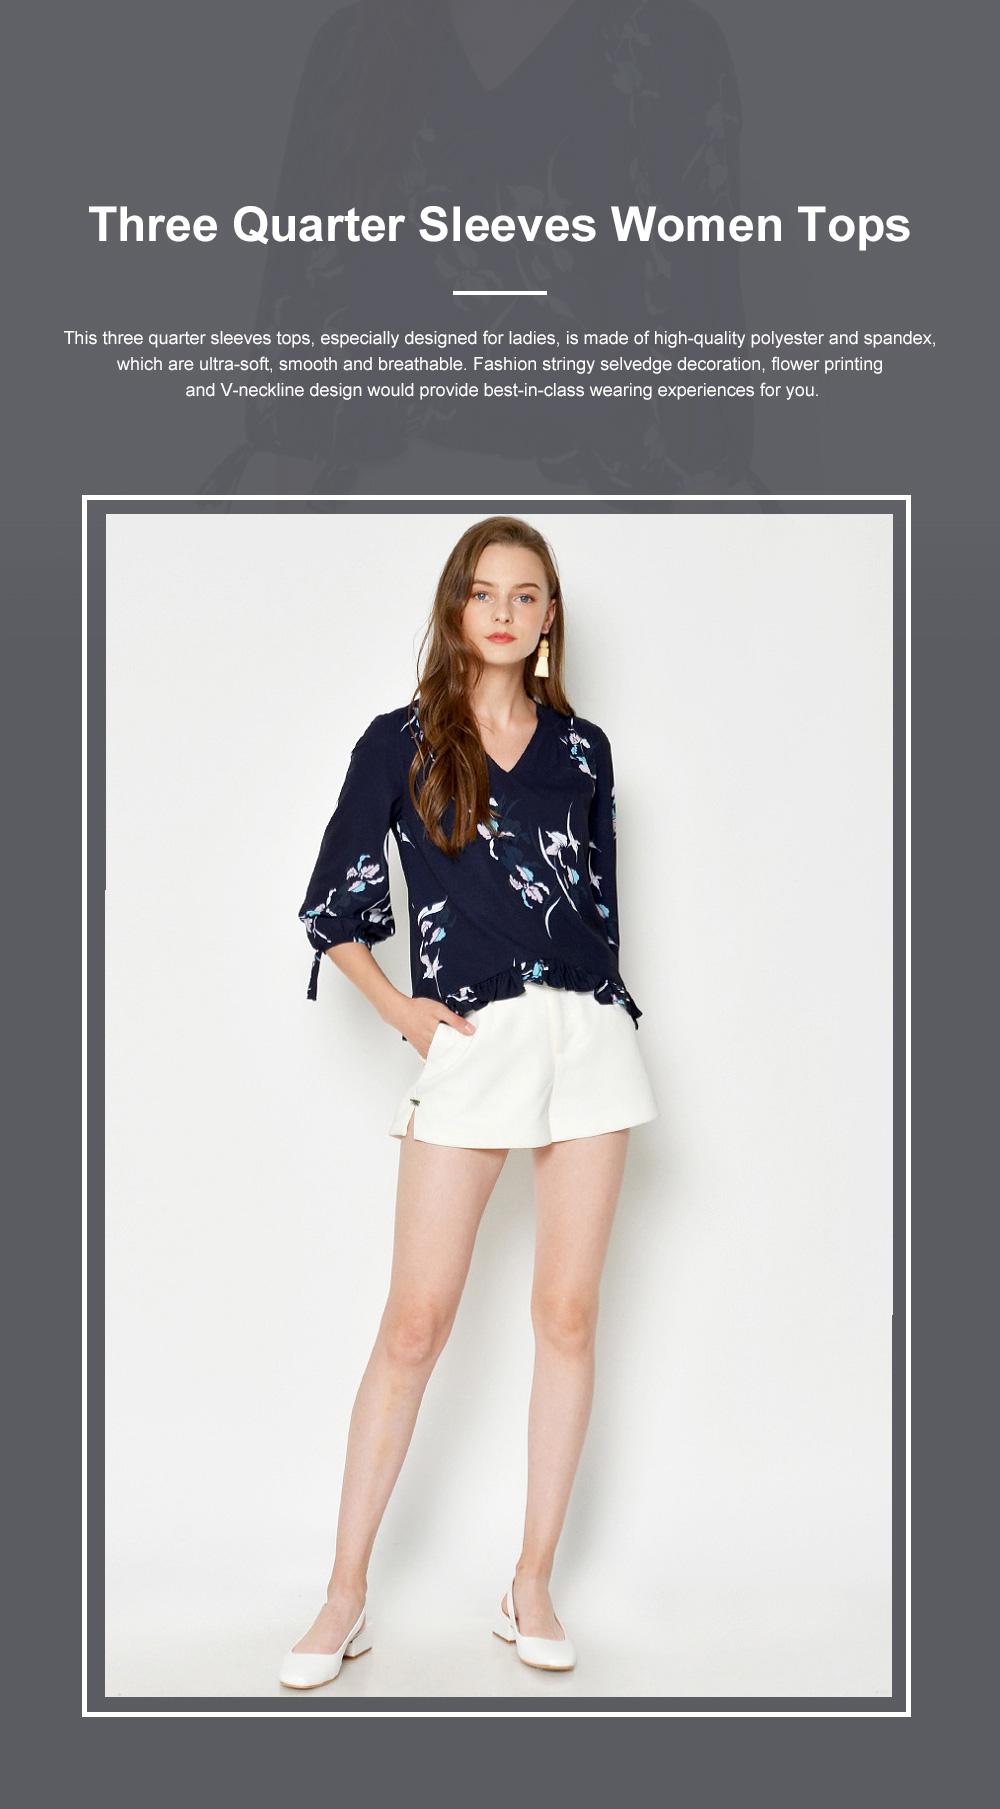 Fashion Navy Blue Printing Three Quarter Sleeves Women Tops, V-neckline Chiffon with Stringy Selvedge for Ladies 0